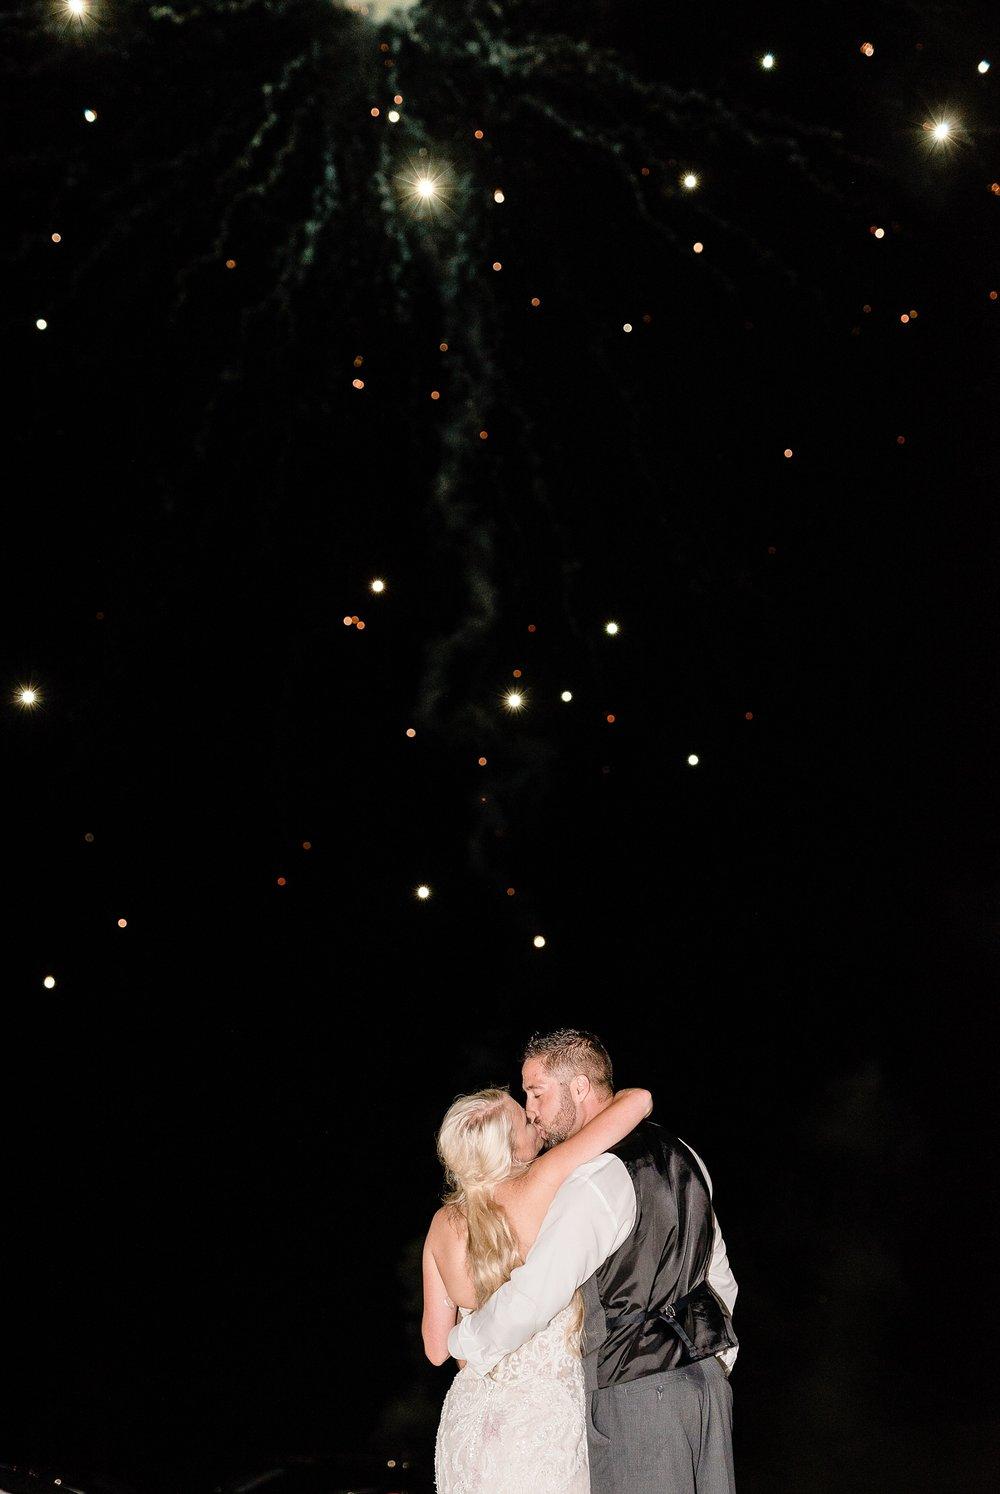 Alan and Heather Horn Wedding by Kelsi Kliethermes Photography Associate - Rachel_0049.jpg